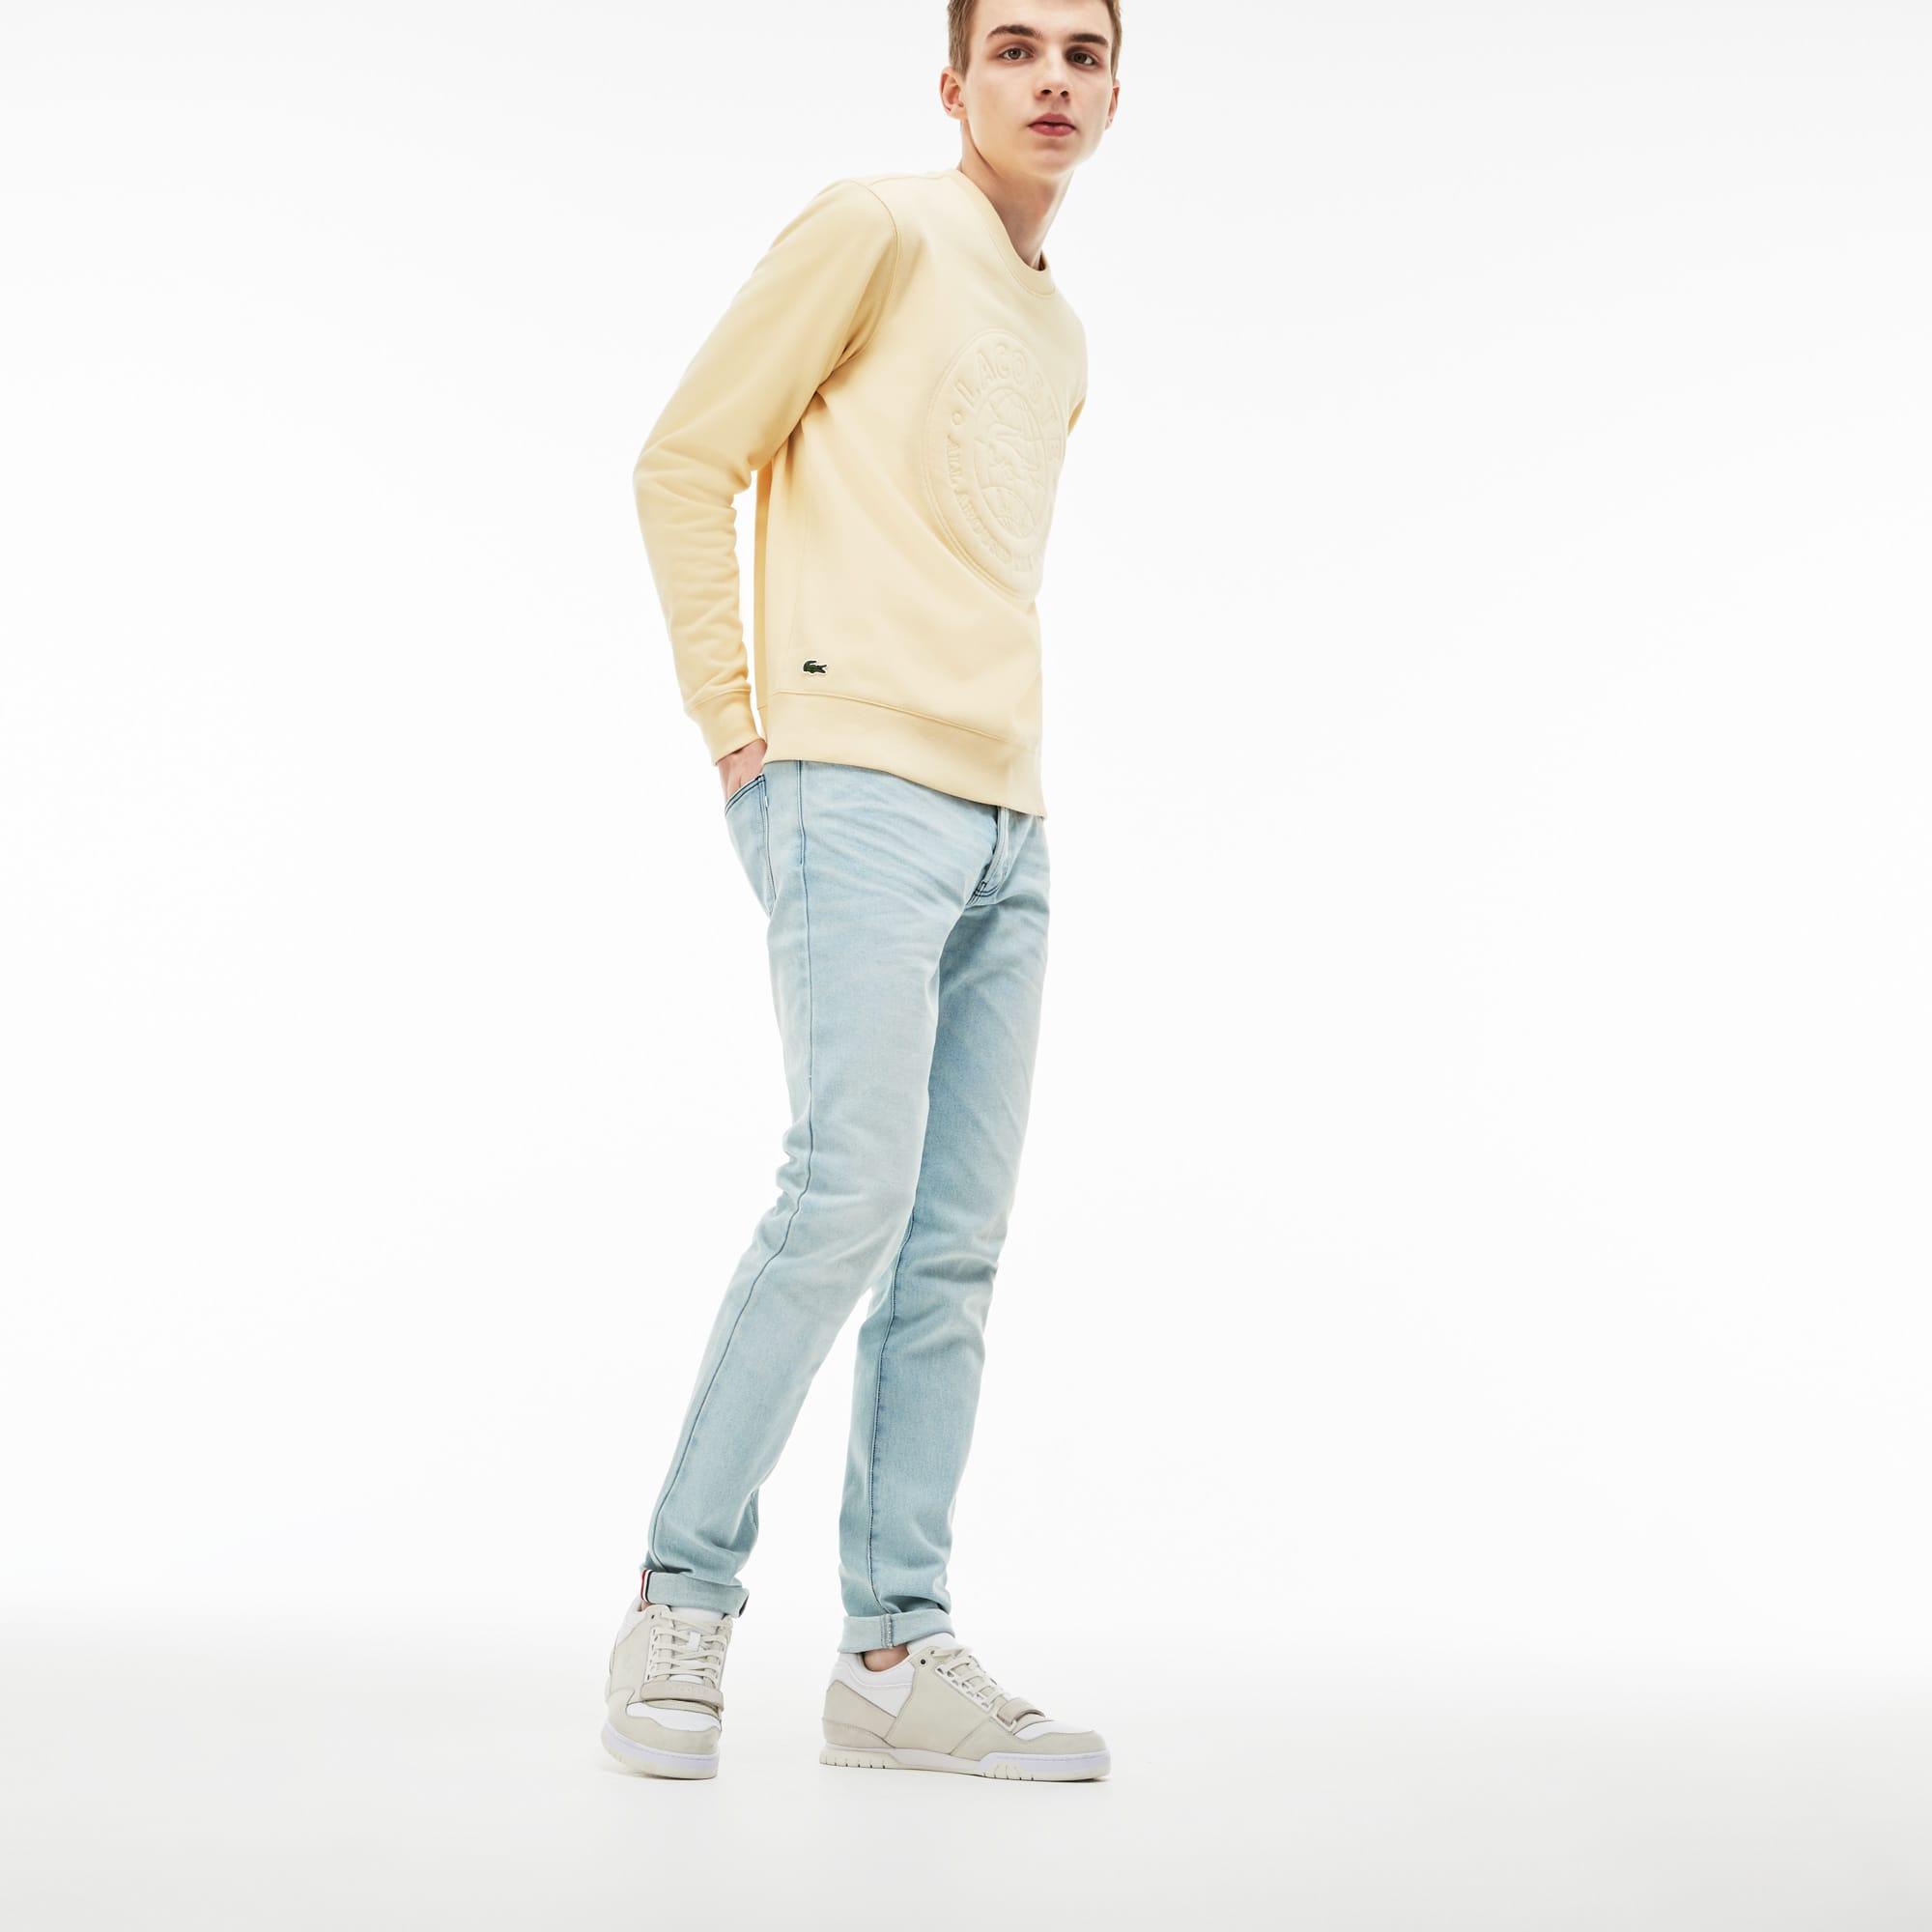 Lacoste LIVE-jeans heren stretch-denim met 5 zakken en omgevouwen rand